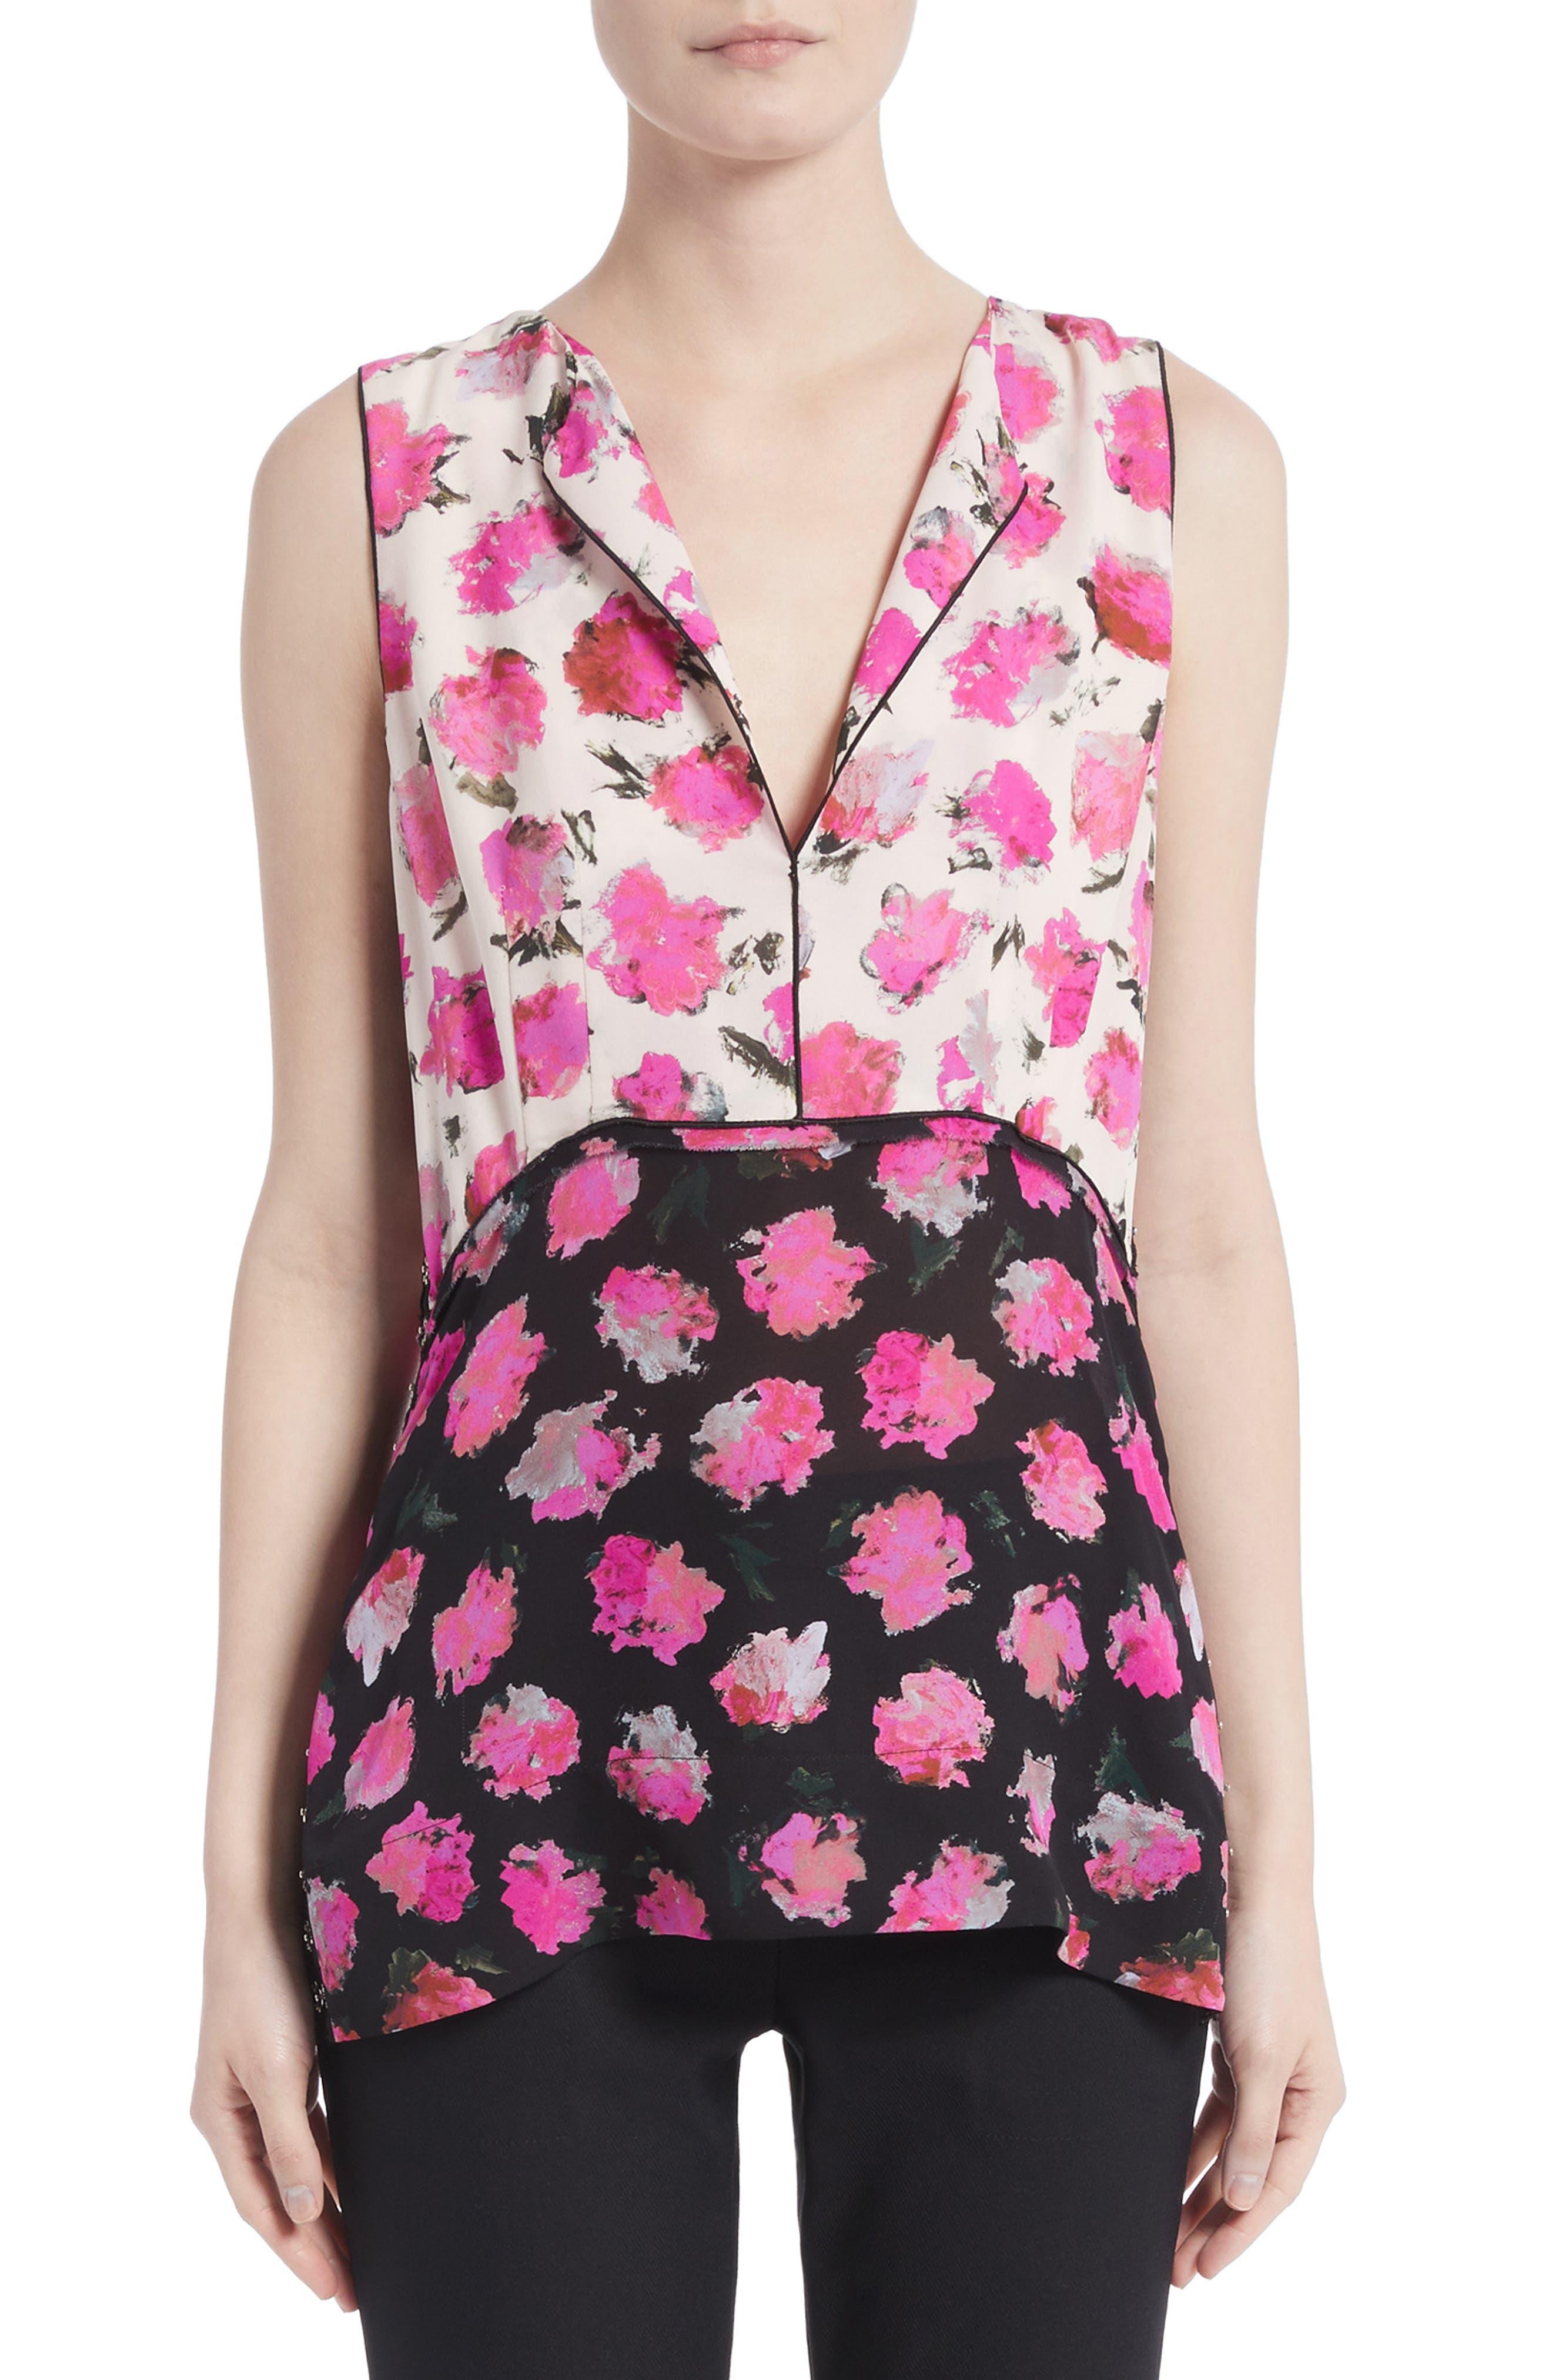 Floral Print Silk Georgette Top,                         Main,                         color, Black/ Fucshia Carnation